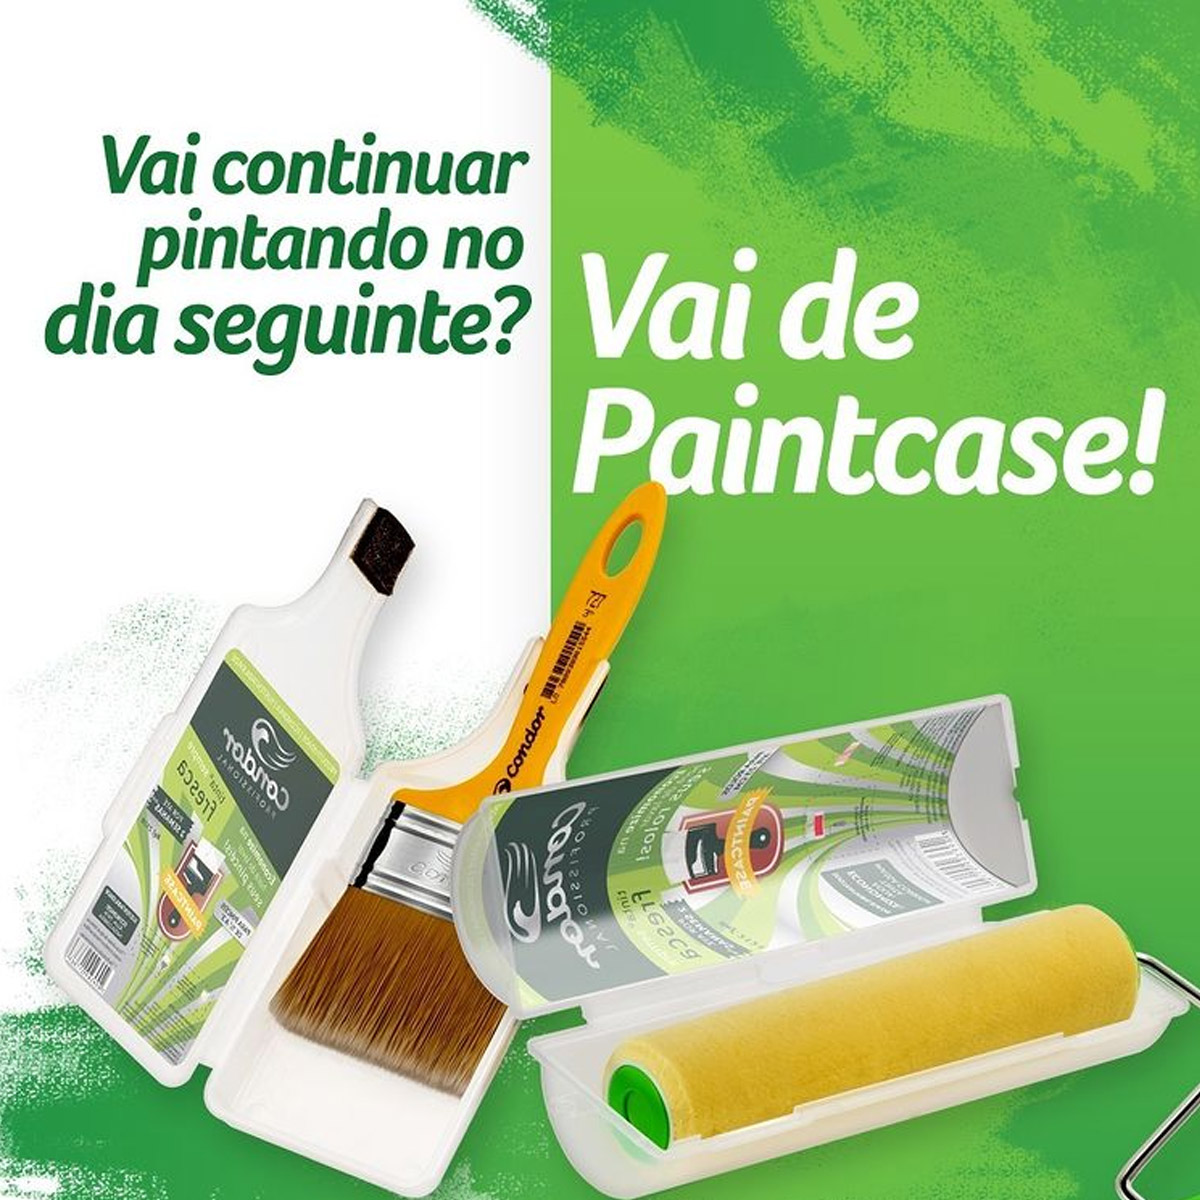 Capa Rolo Mantem Tinta Fresca Paintcase Condor 2121